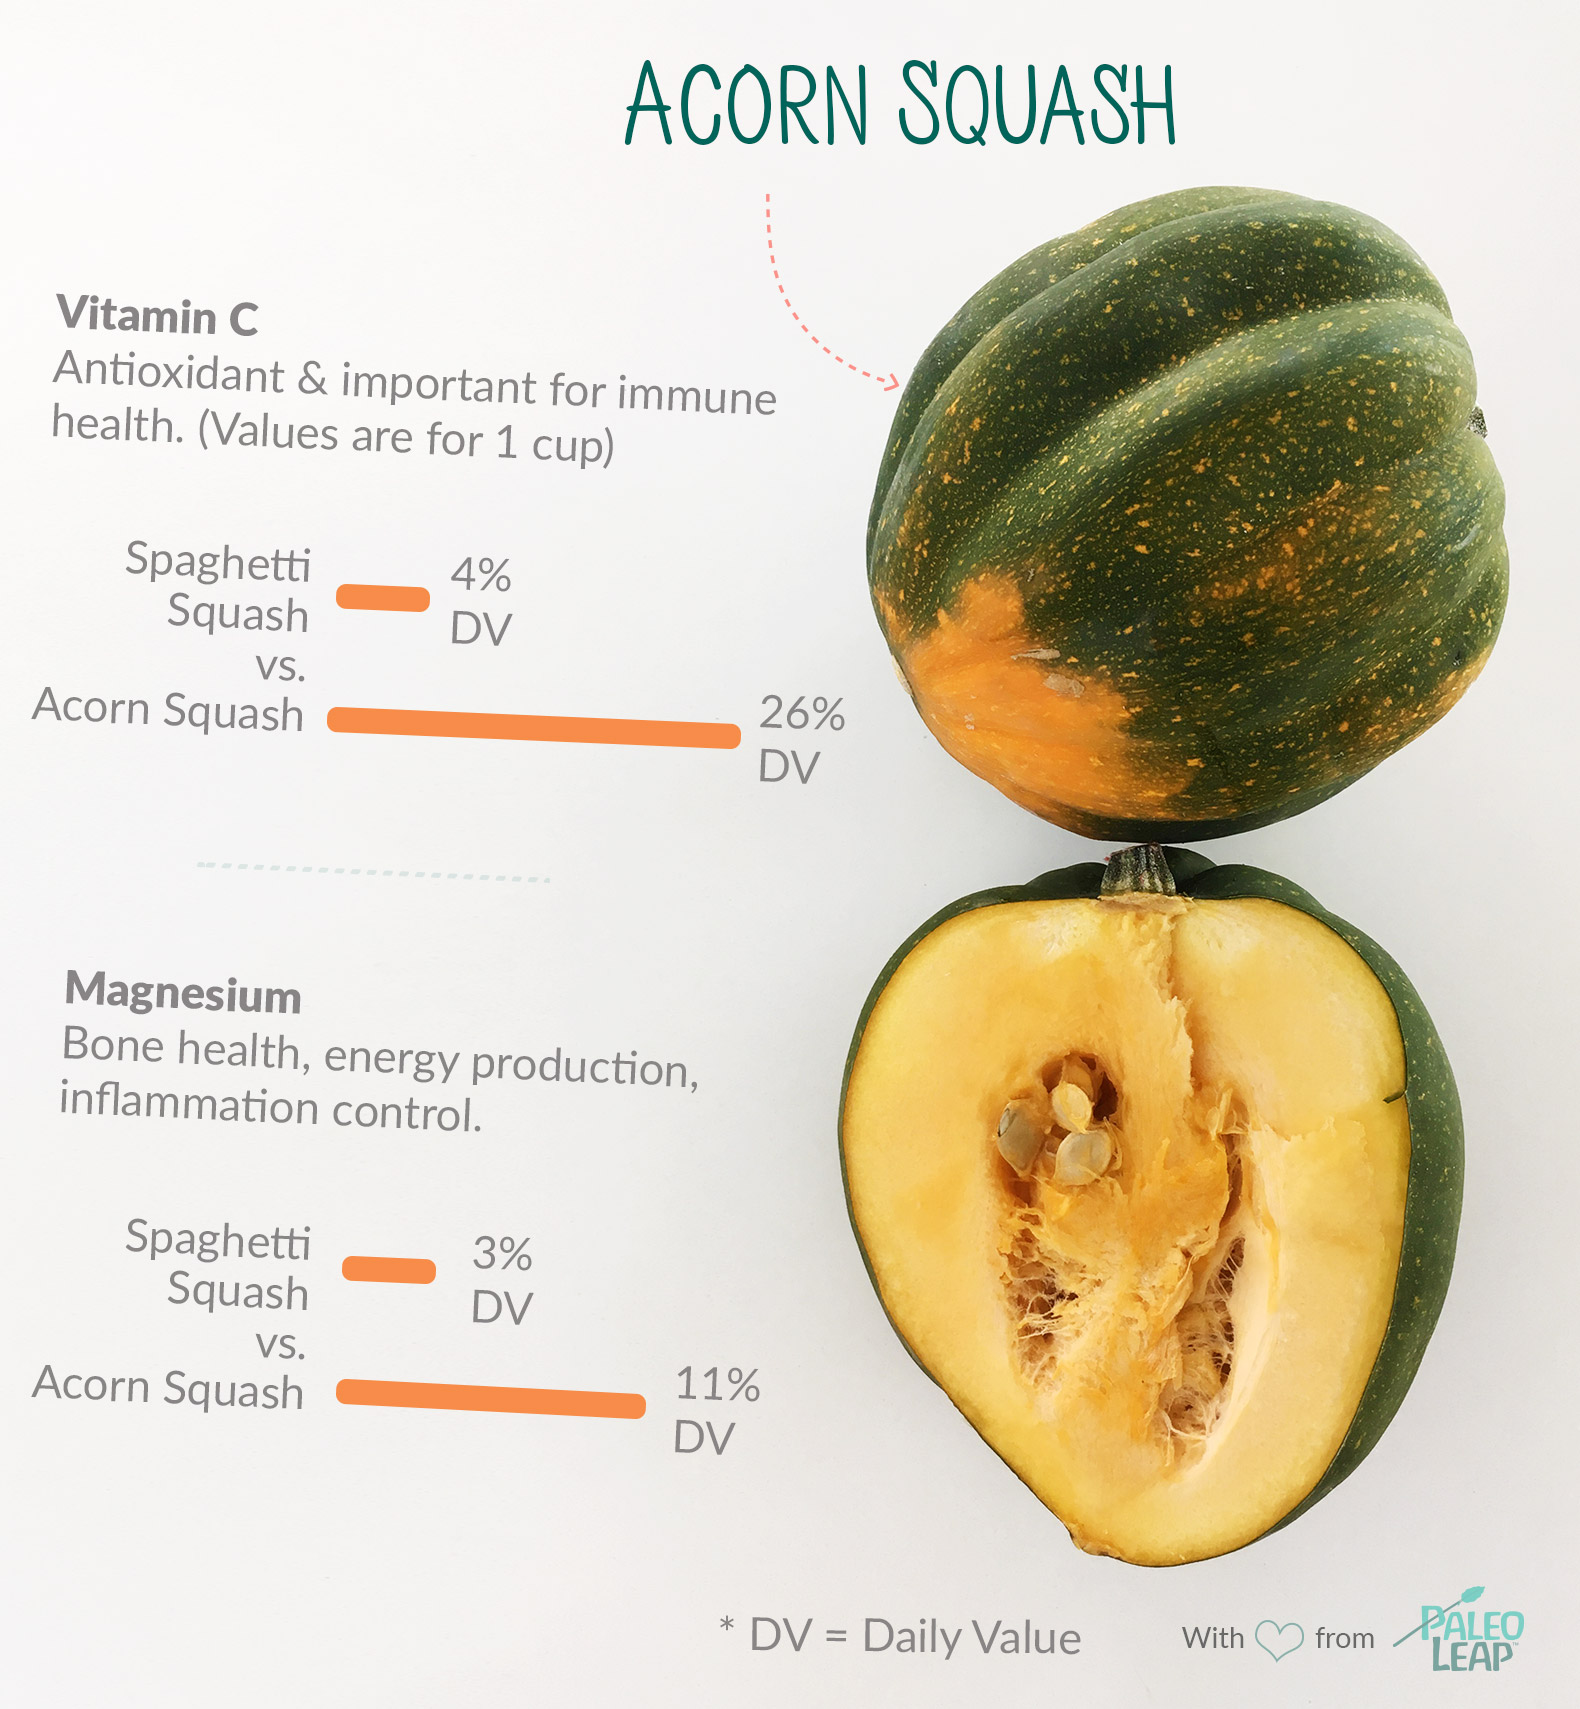 Acorn Squash highlights